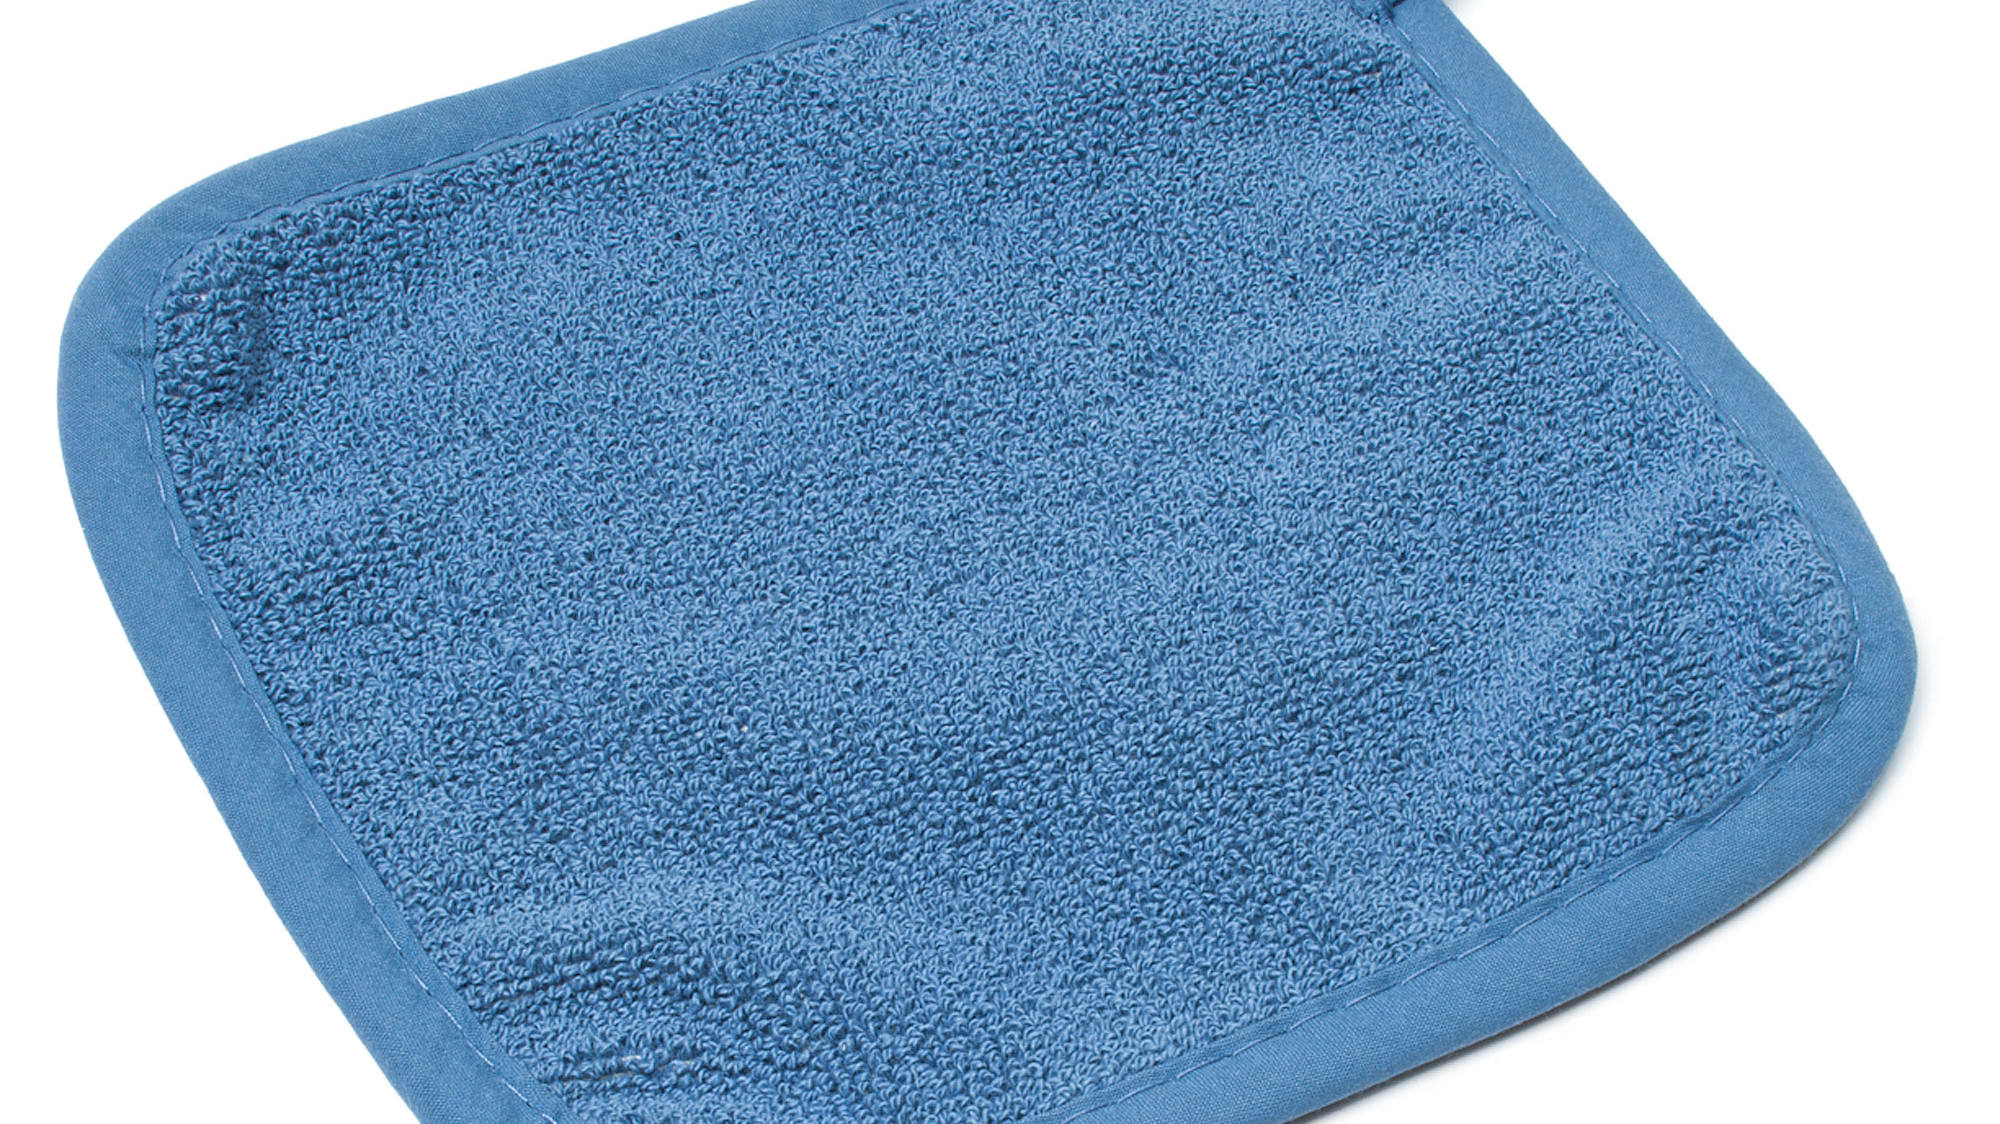 24295 sil potholder ritz basic potholder 30024 federal blue